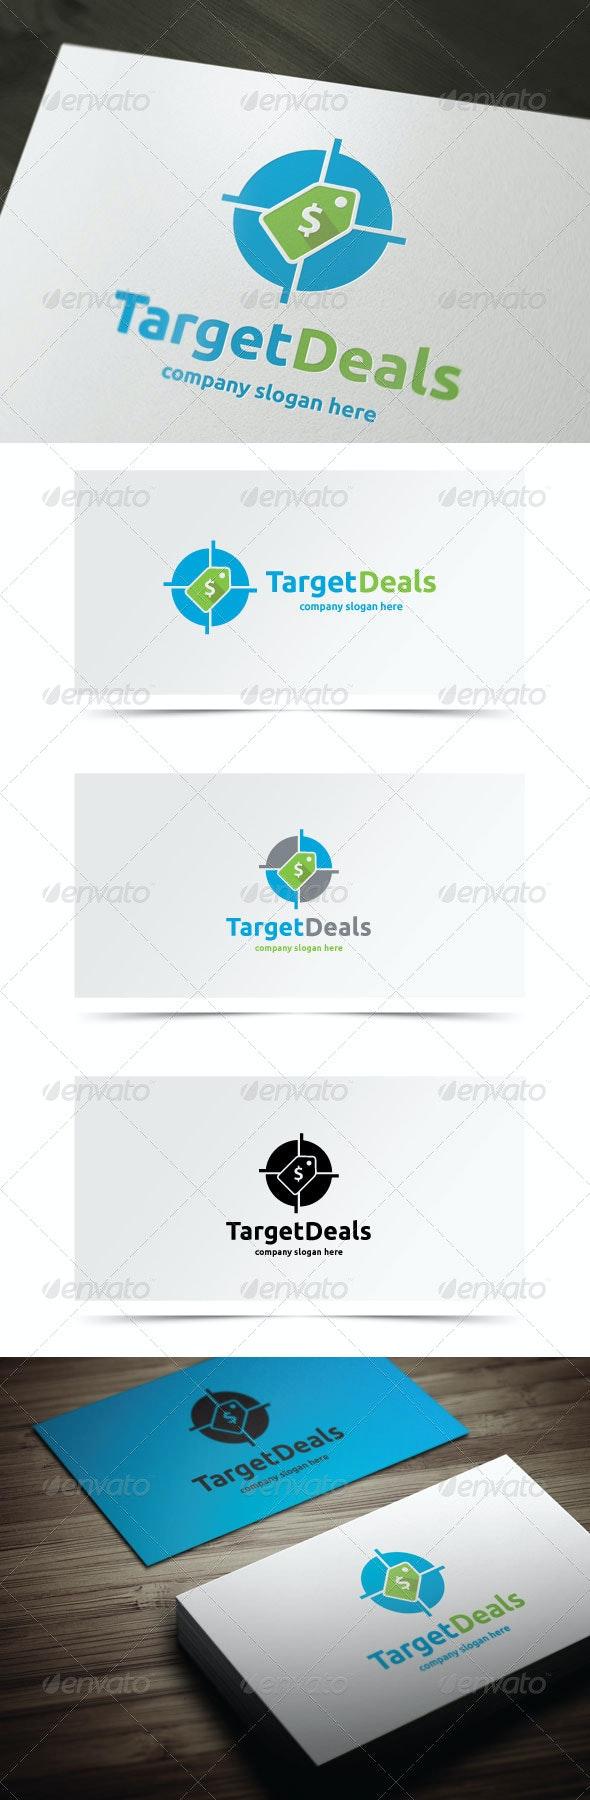 Target Deals - Objects Logo Templates